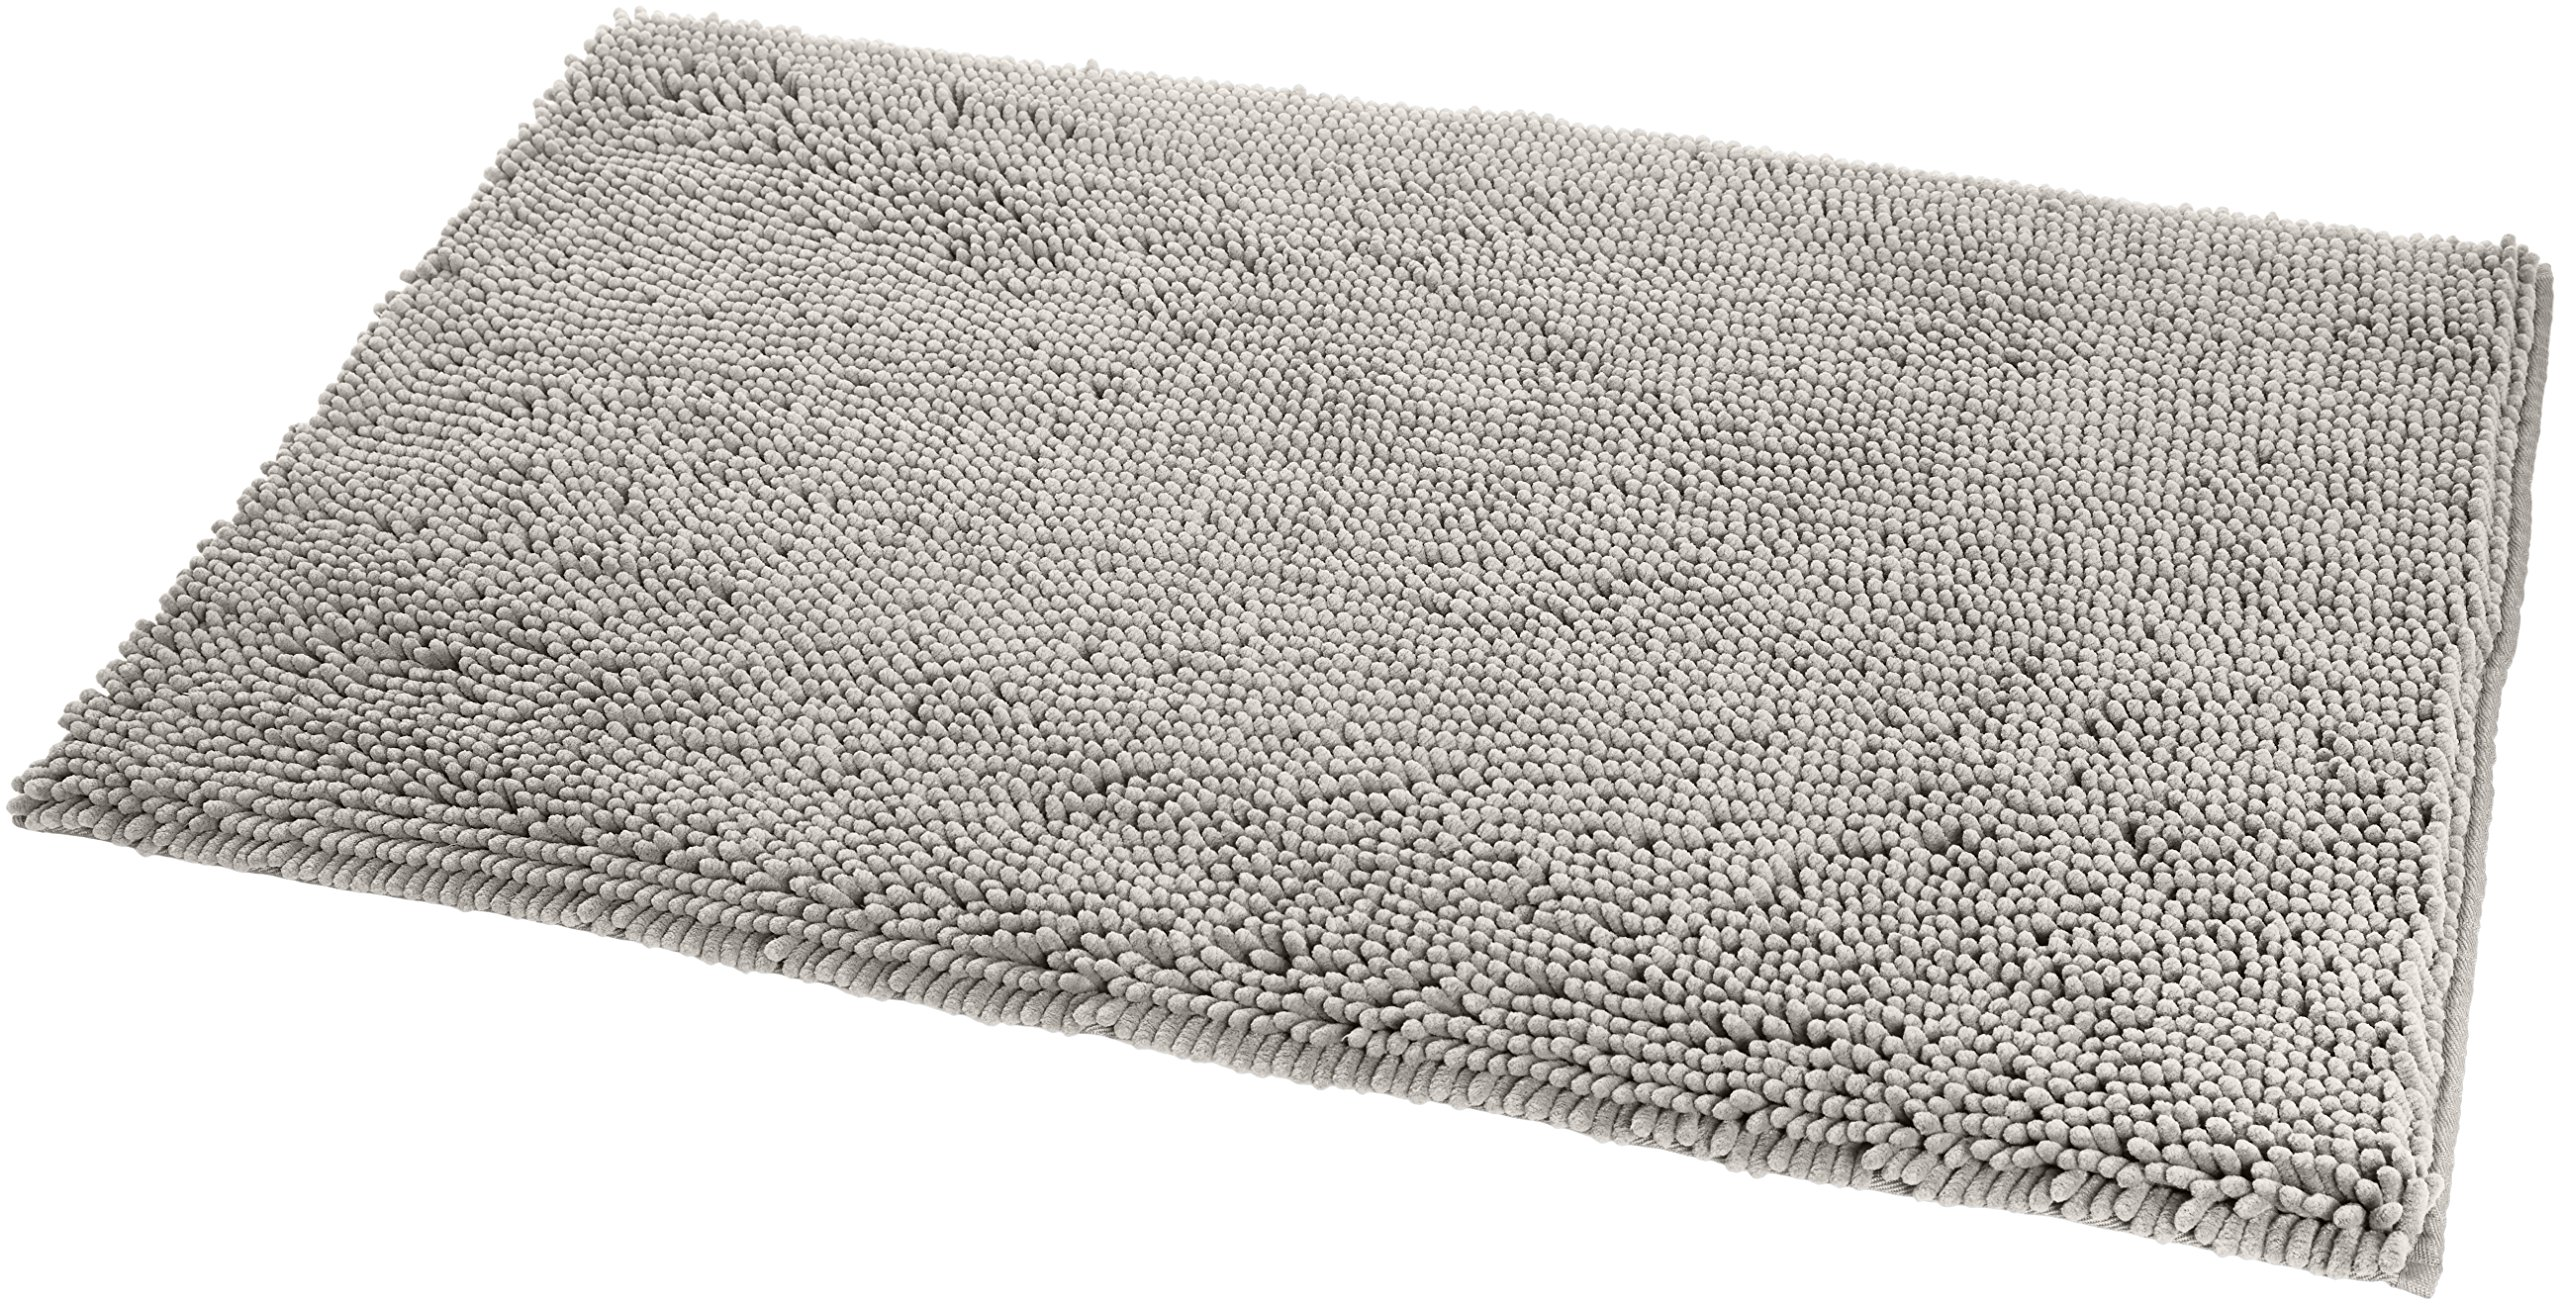 AmazonBasics Non-Slip Microfiber Shag Bathroom Rug Mat, 21'' x 34'', Platinum by AmazonBasics